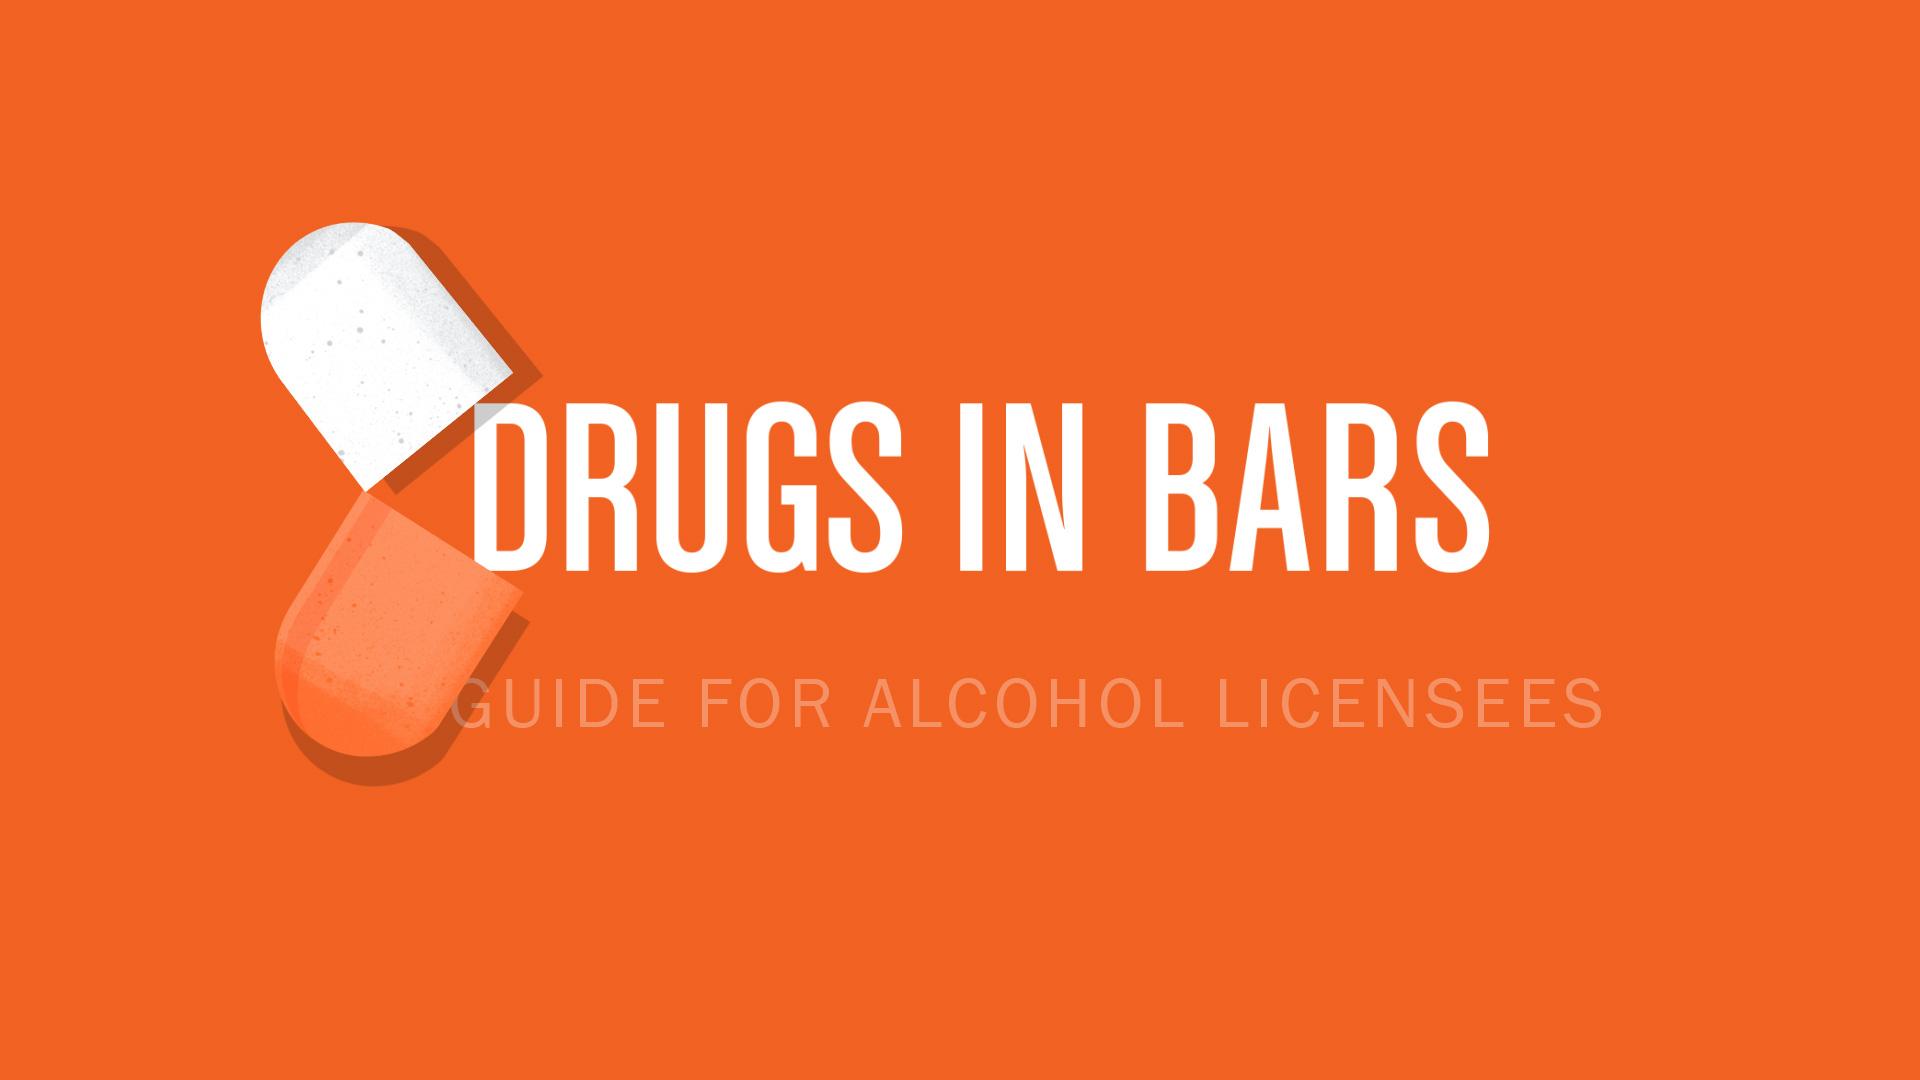 Drugs in Bars - Storyboard 01